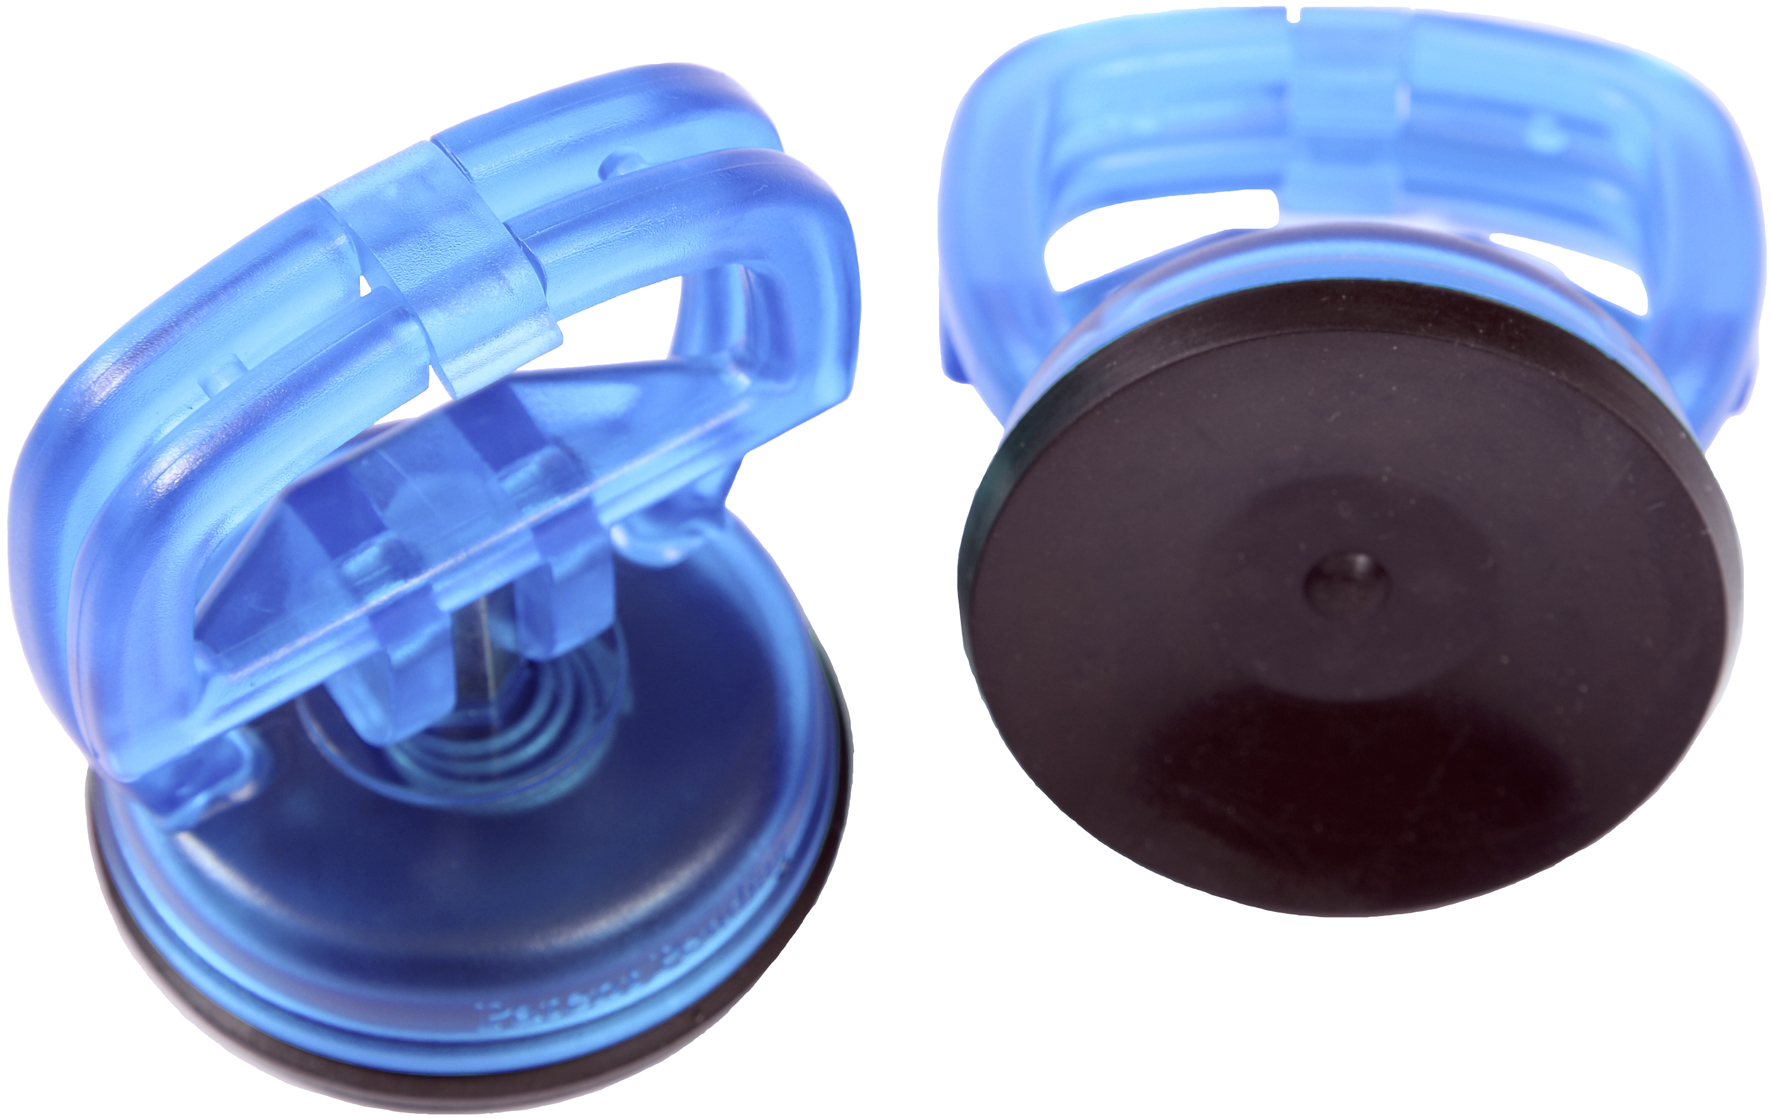 Minisaugheber, pair Capacity 12 kg / piece KUNZER (7MSH02)